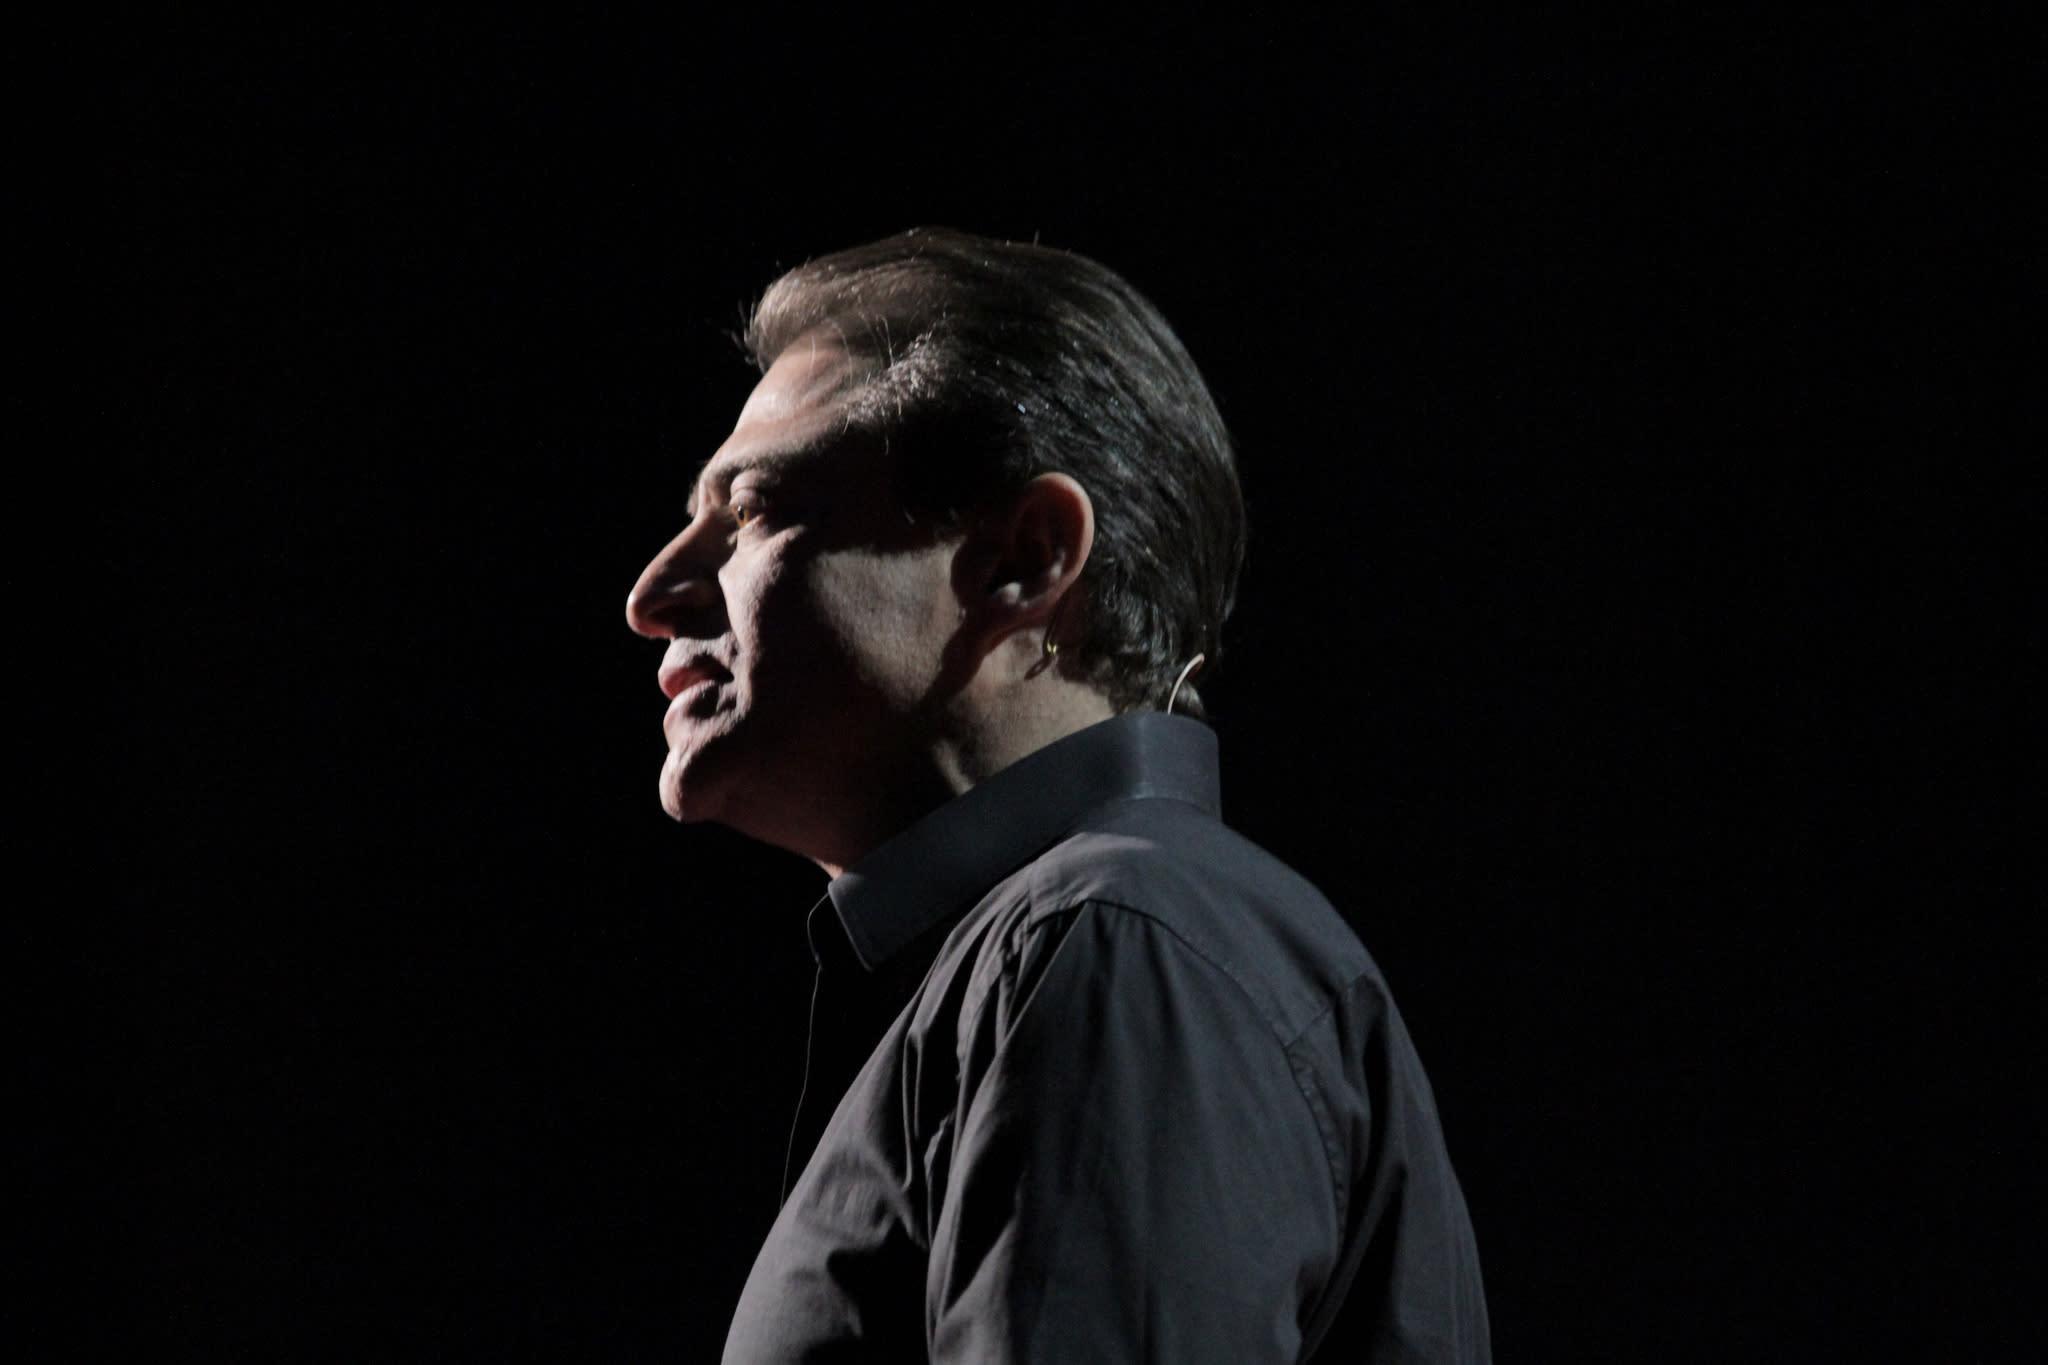 Peter Diamandis, XPrize